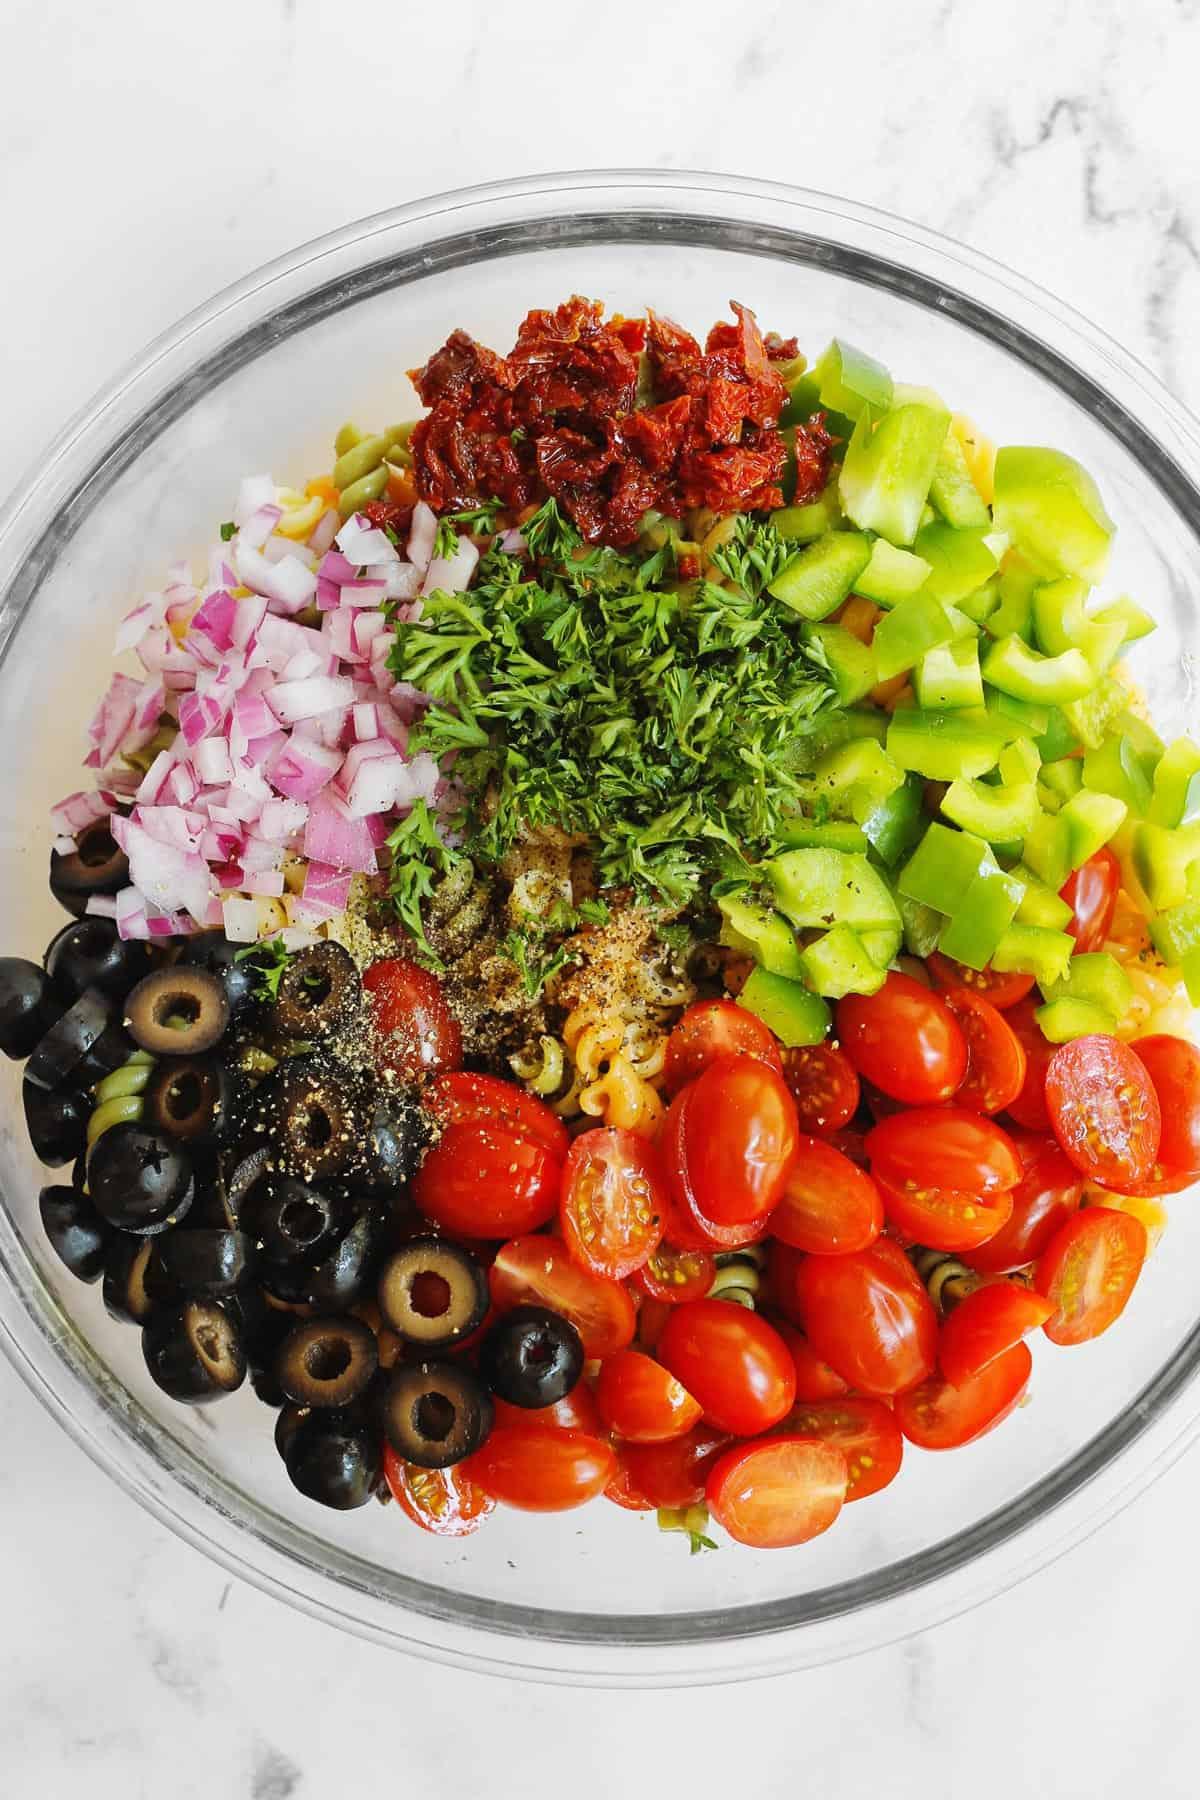 Veggie pasta salad ingredients